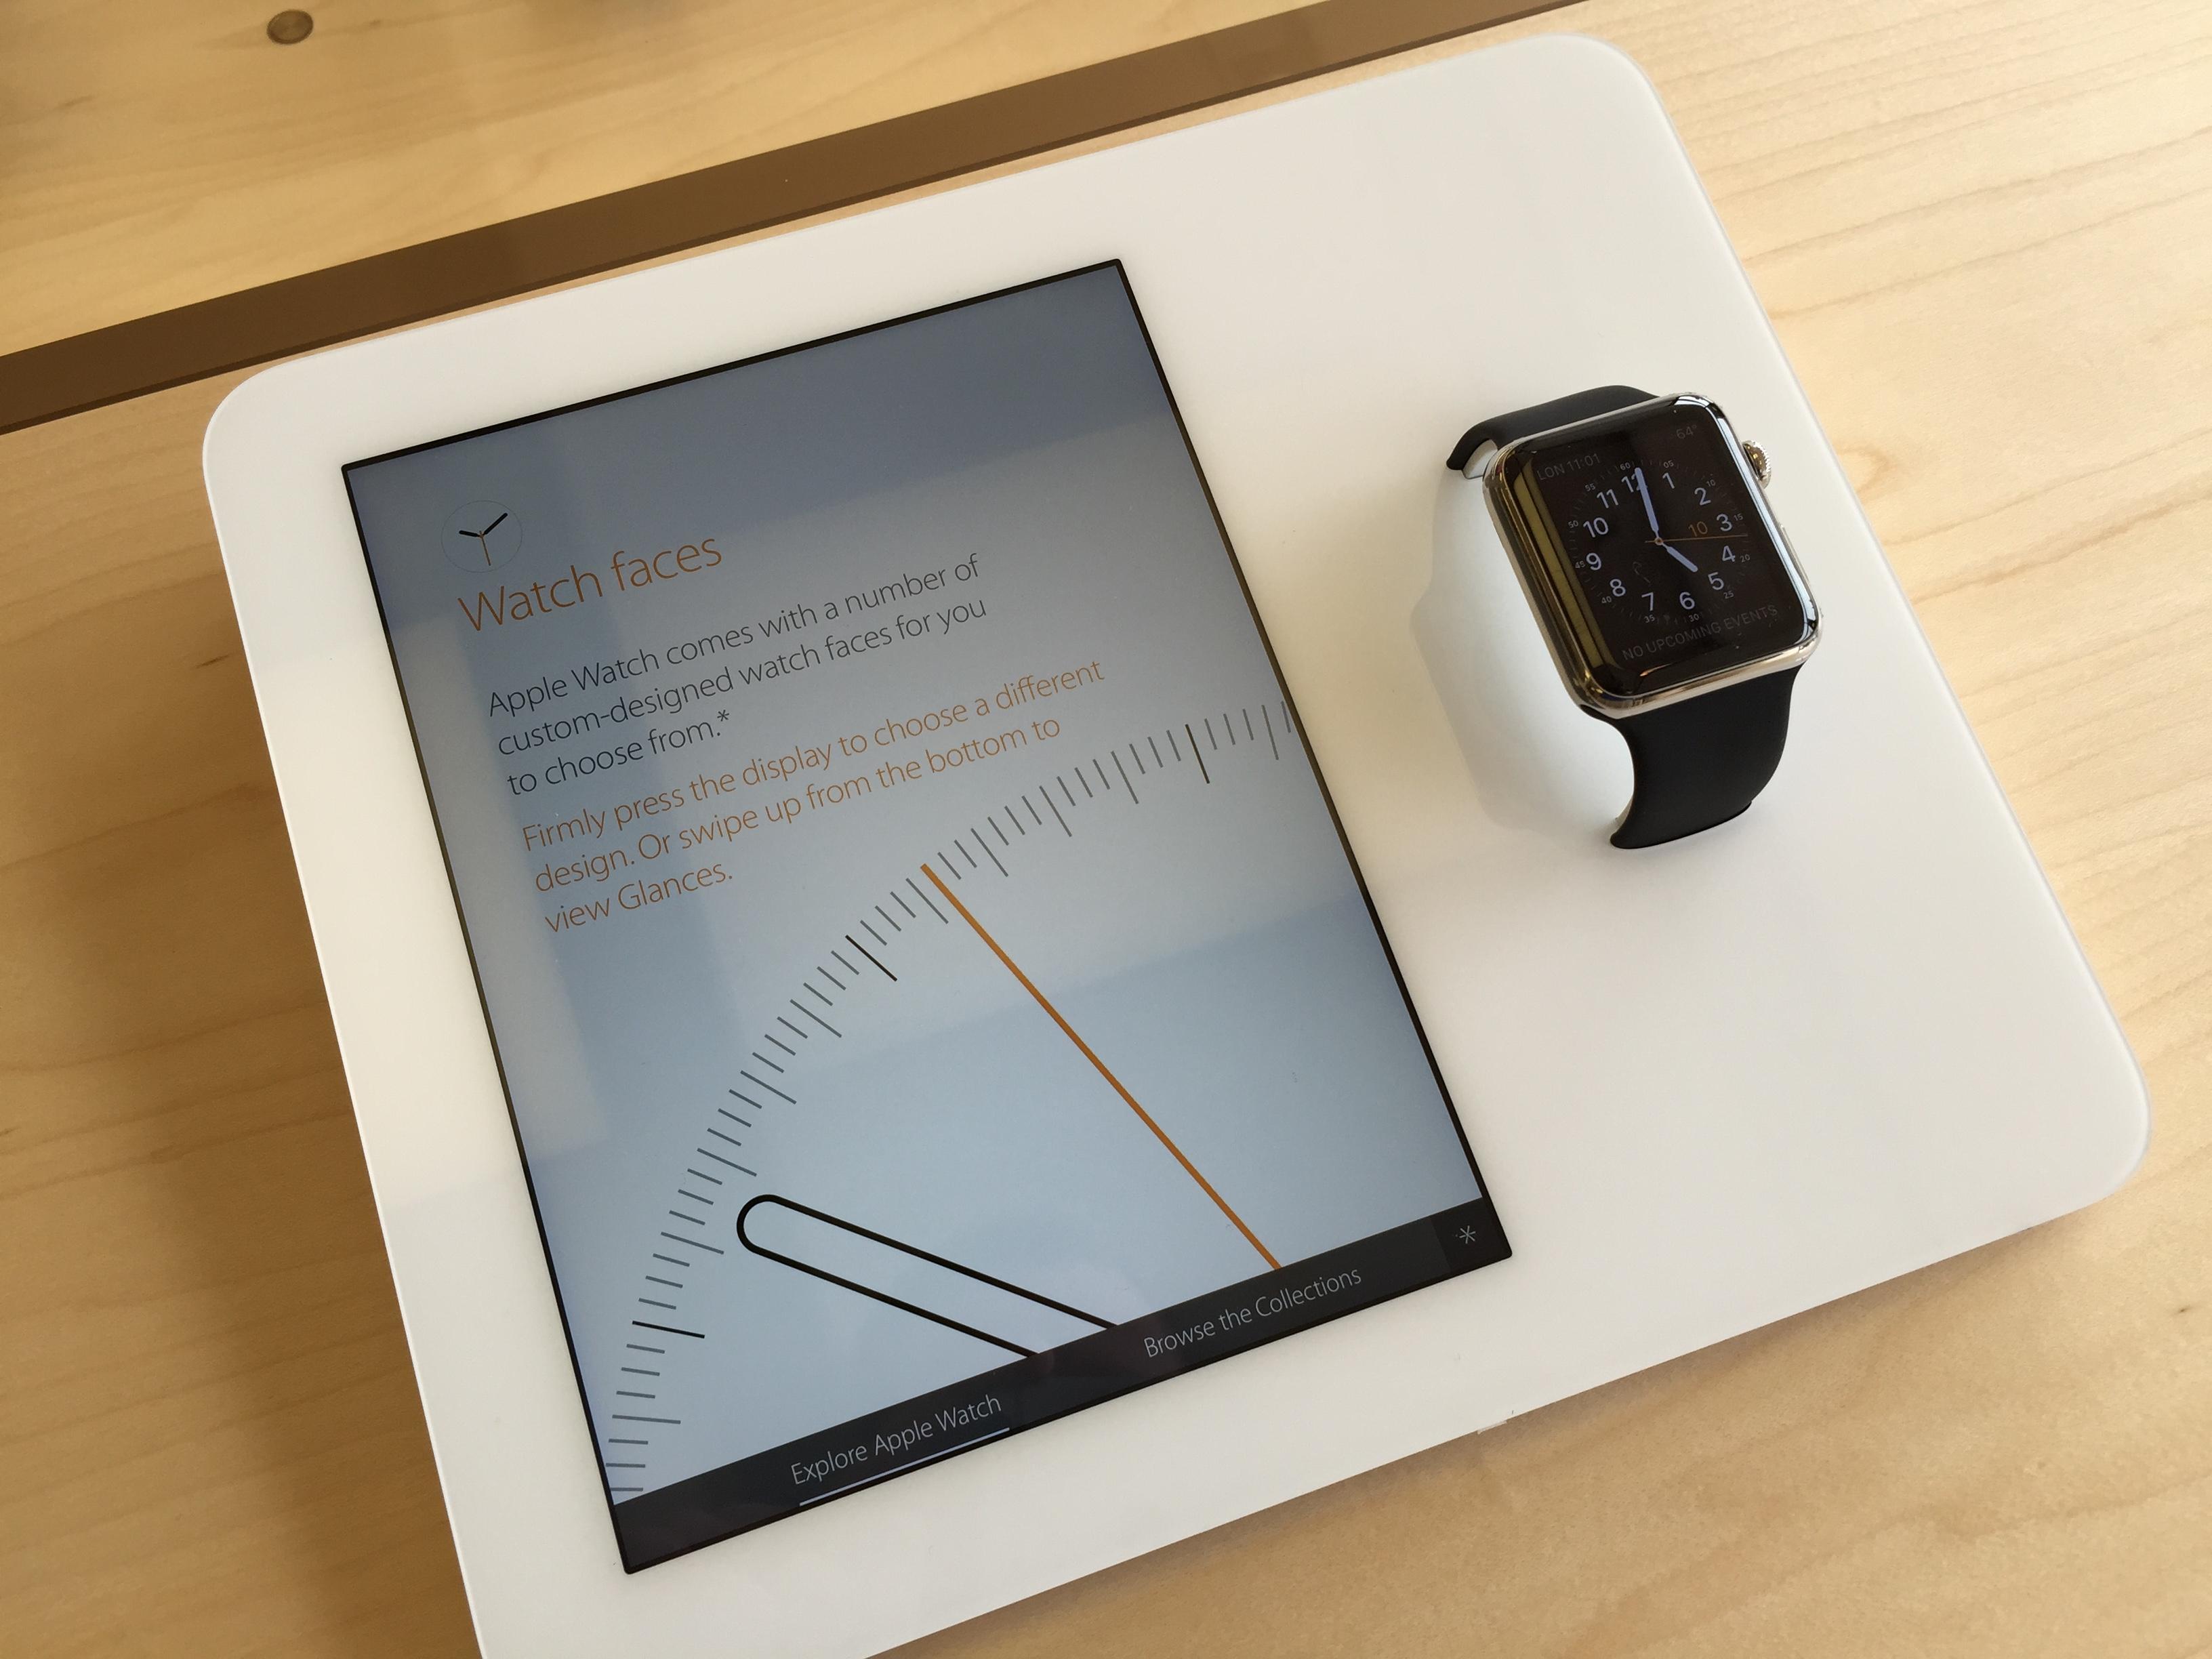 Apple Watch display